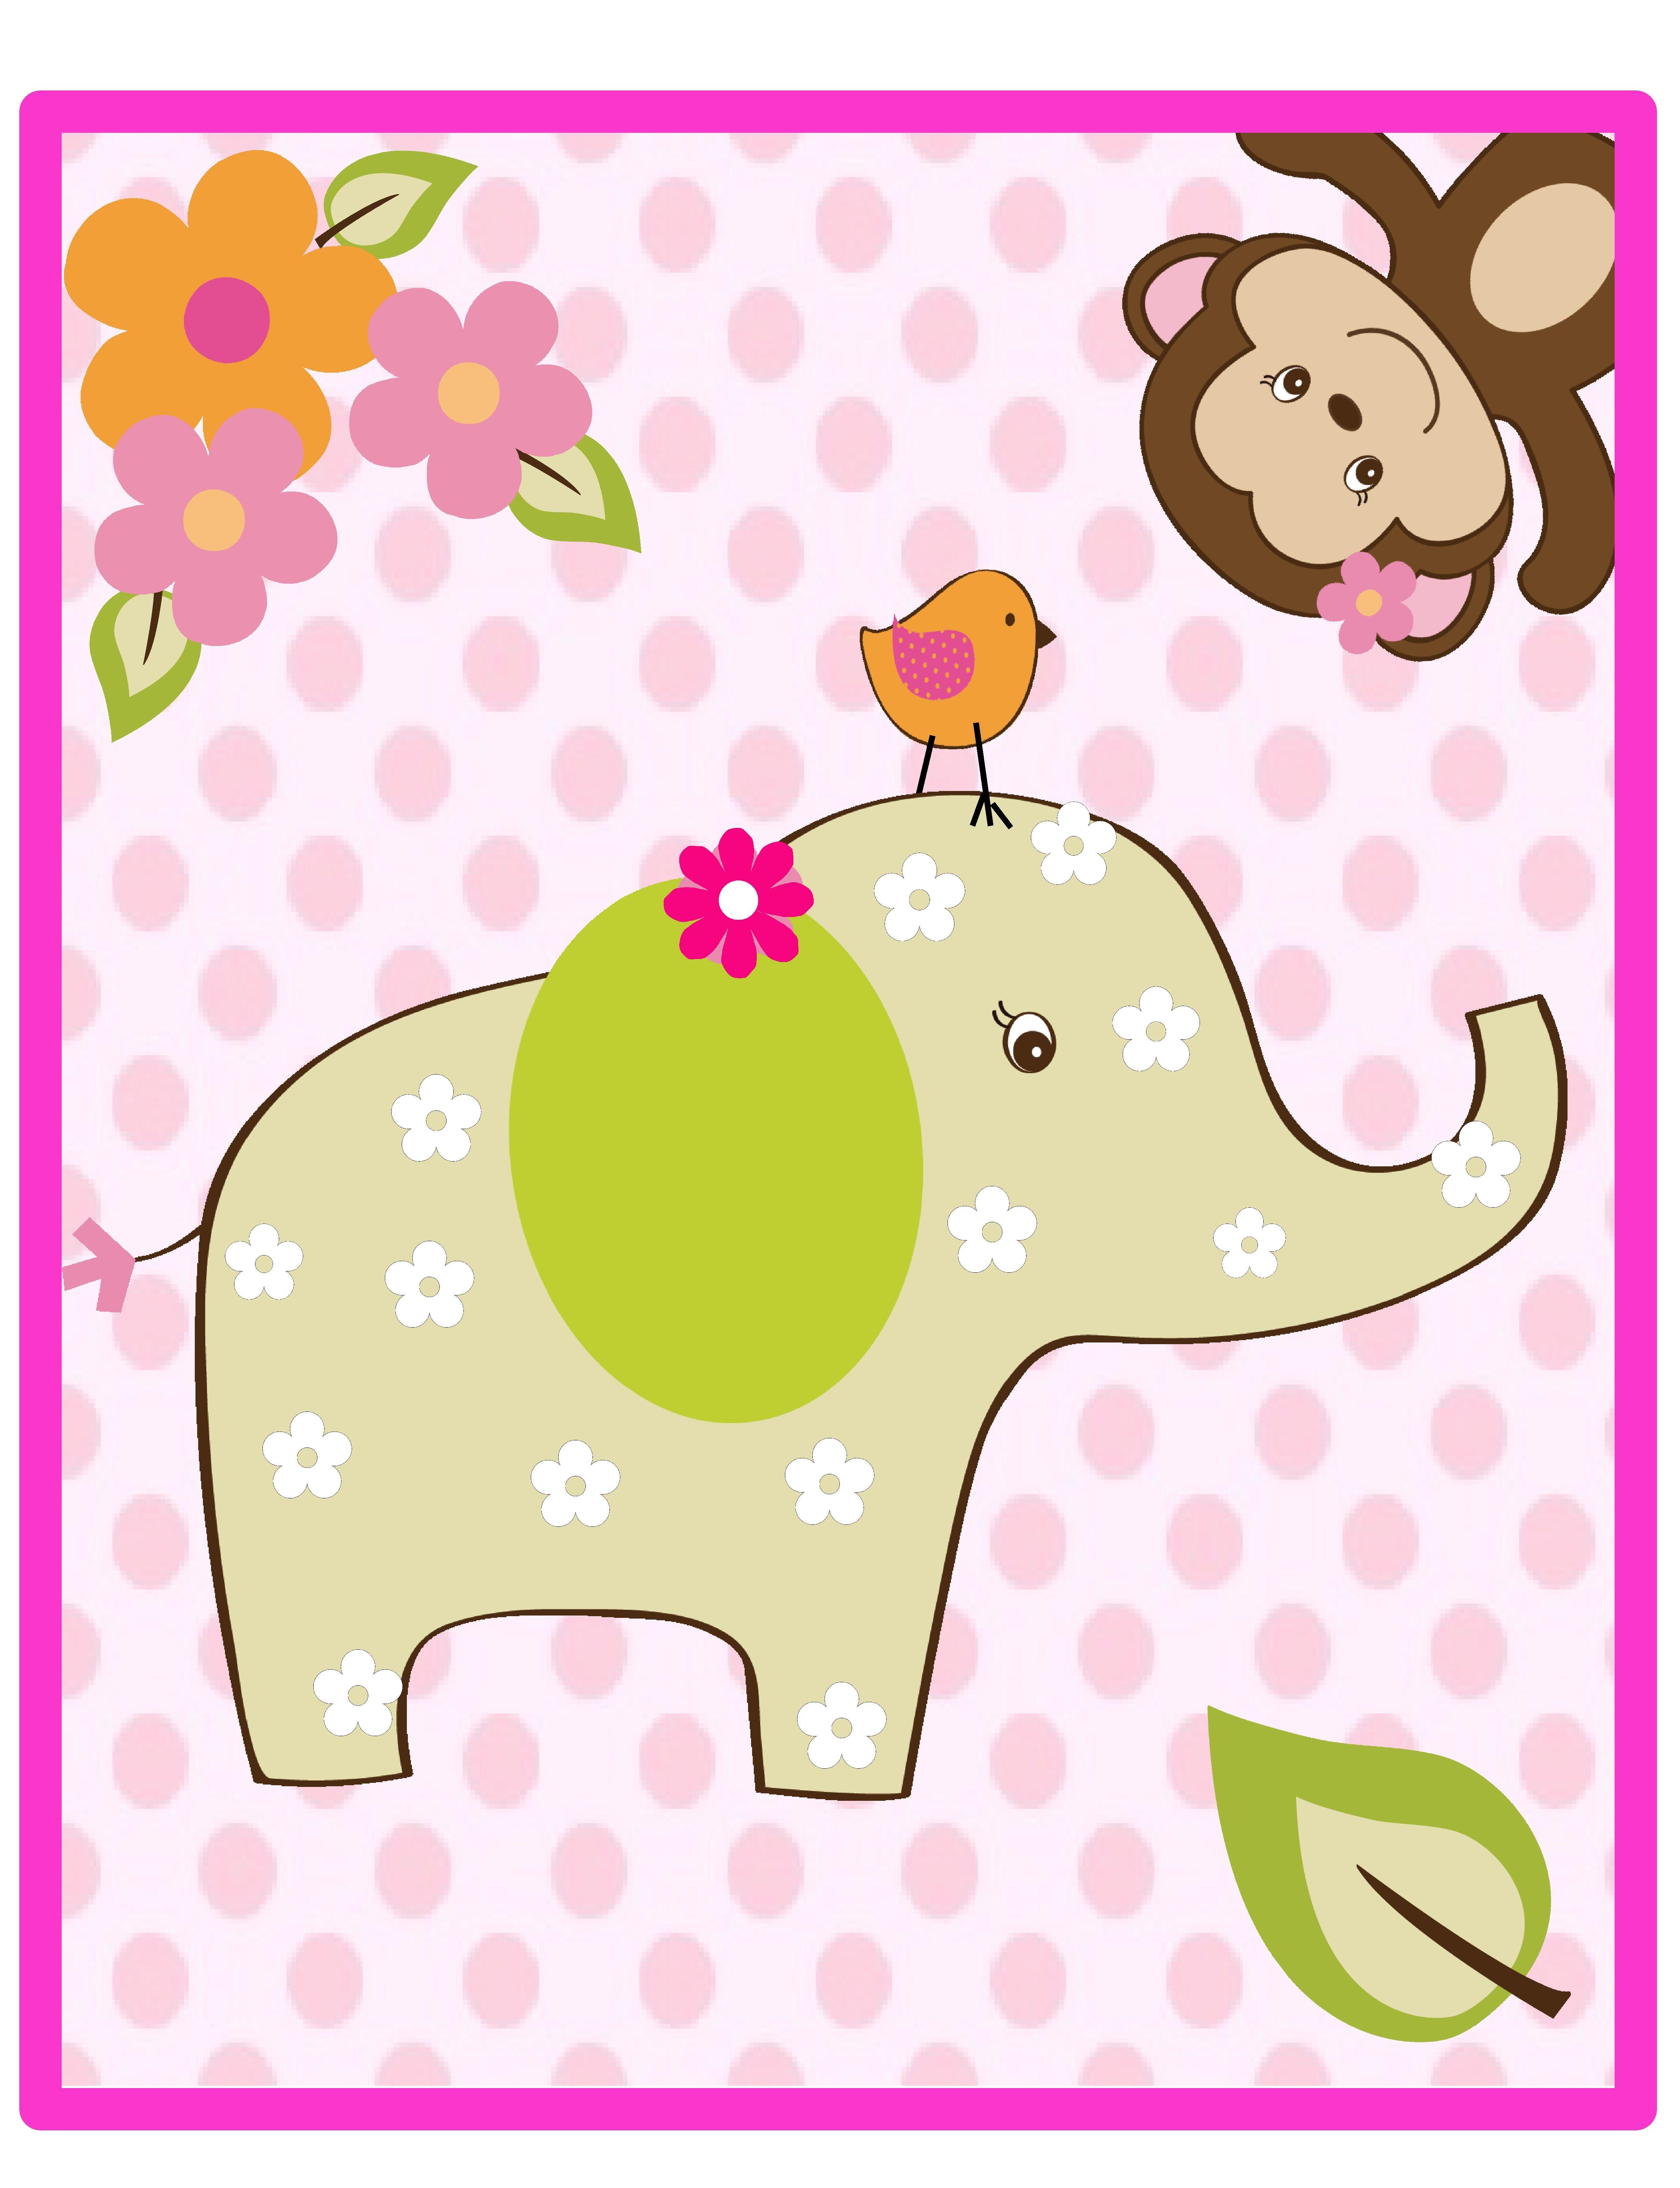 Print for framing for Jungle Jill nursery for Arianna   DECOR ...